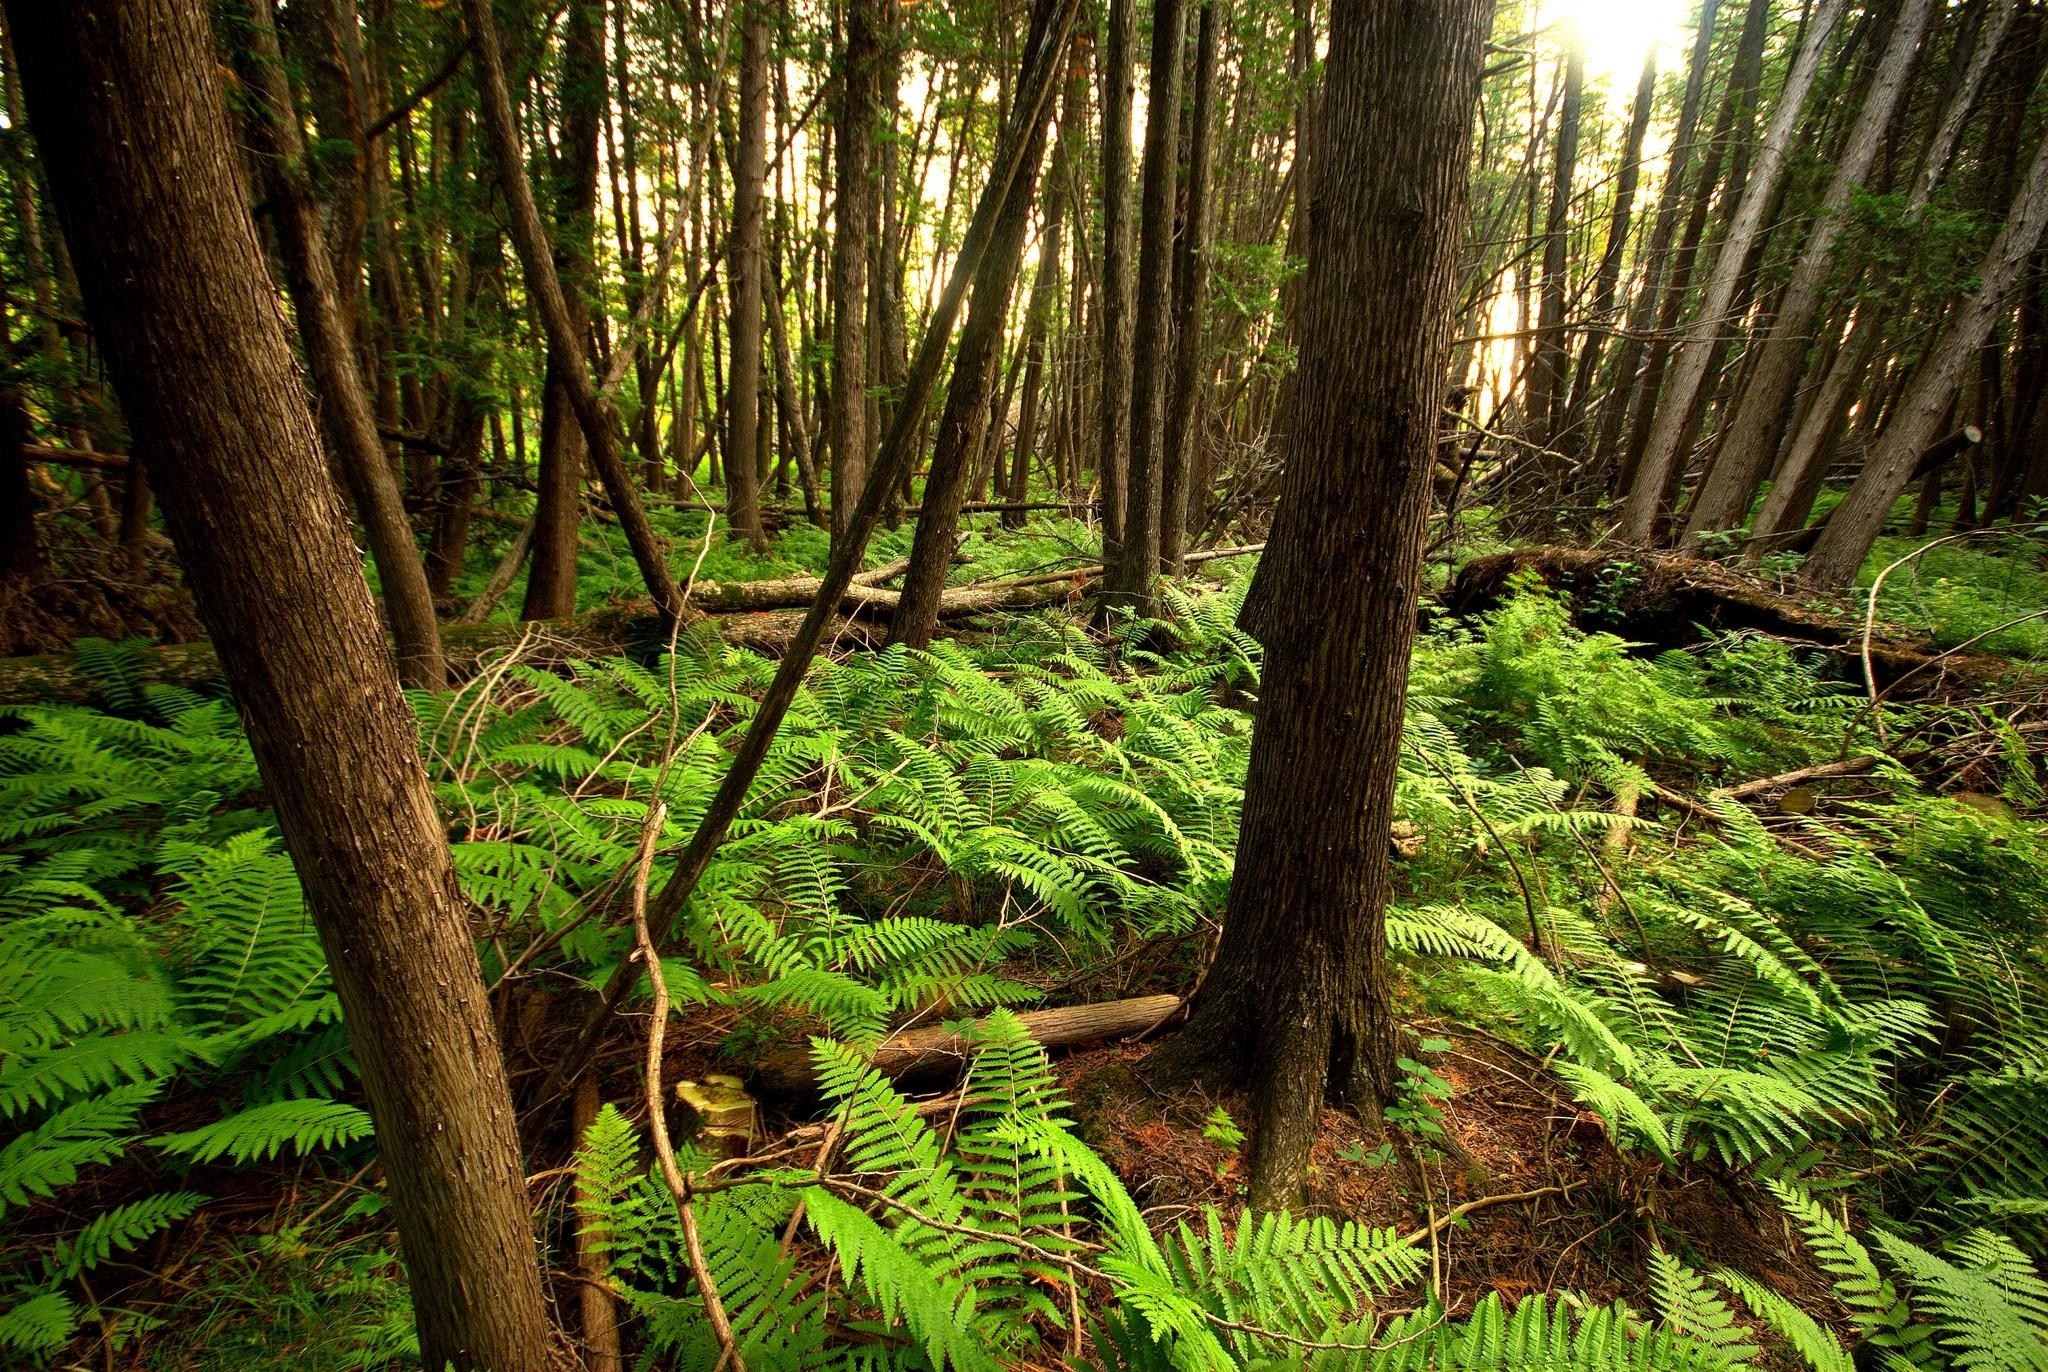 aa62f64bdeafed3daa63_forest.JPG